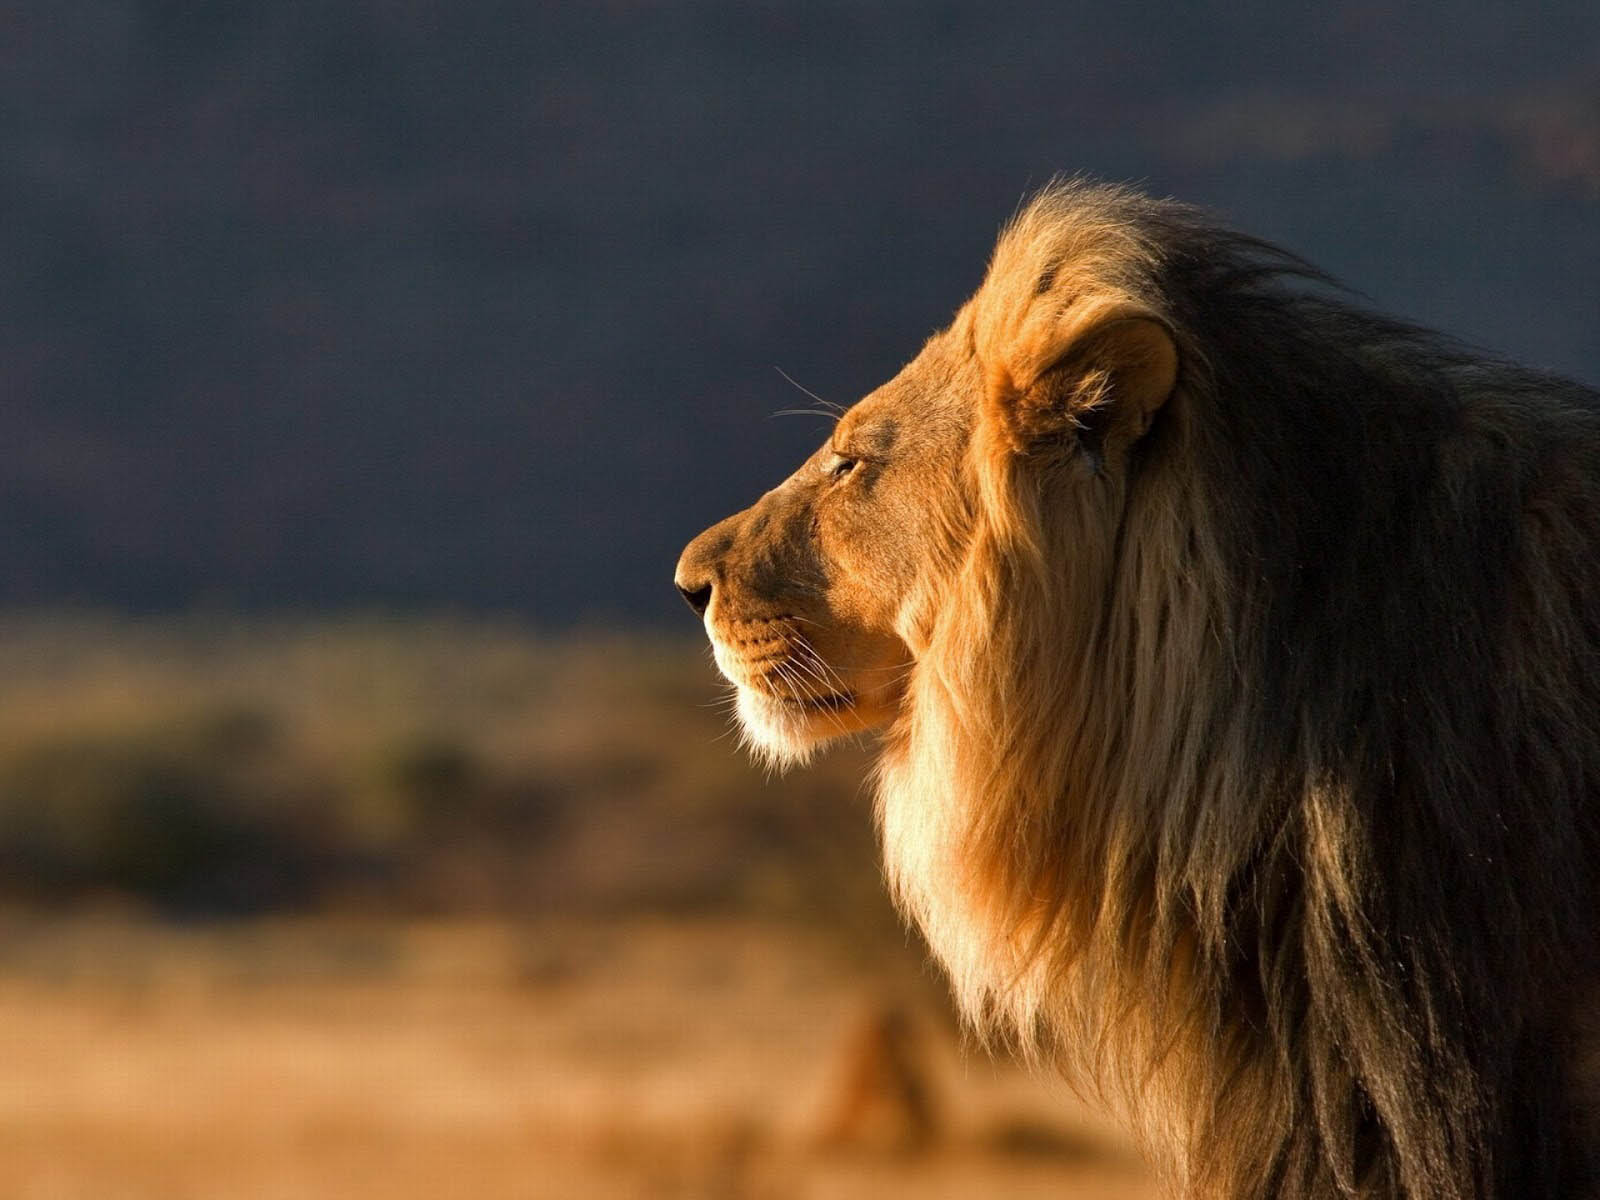 wallpaper: Male Lion Wallpapers